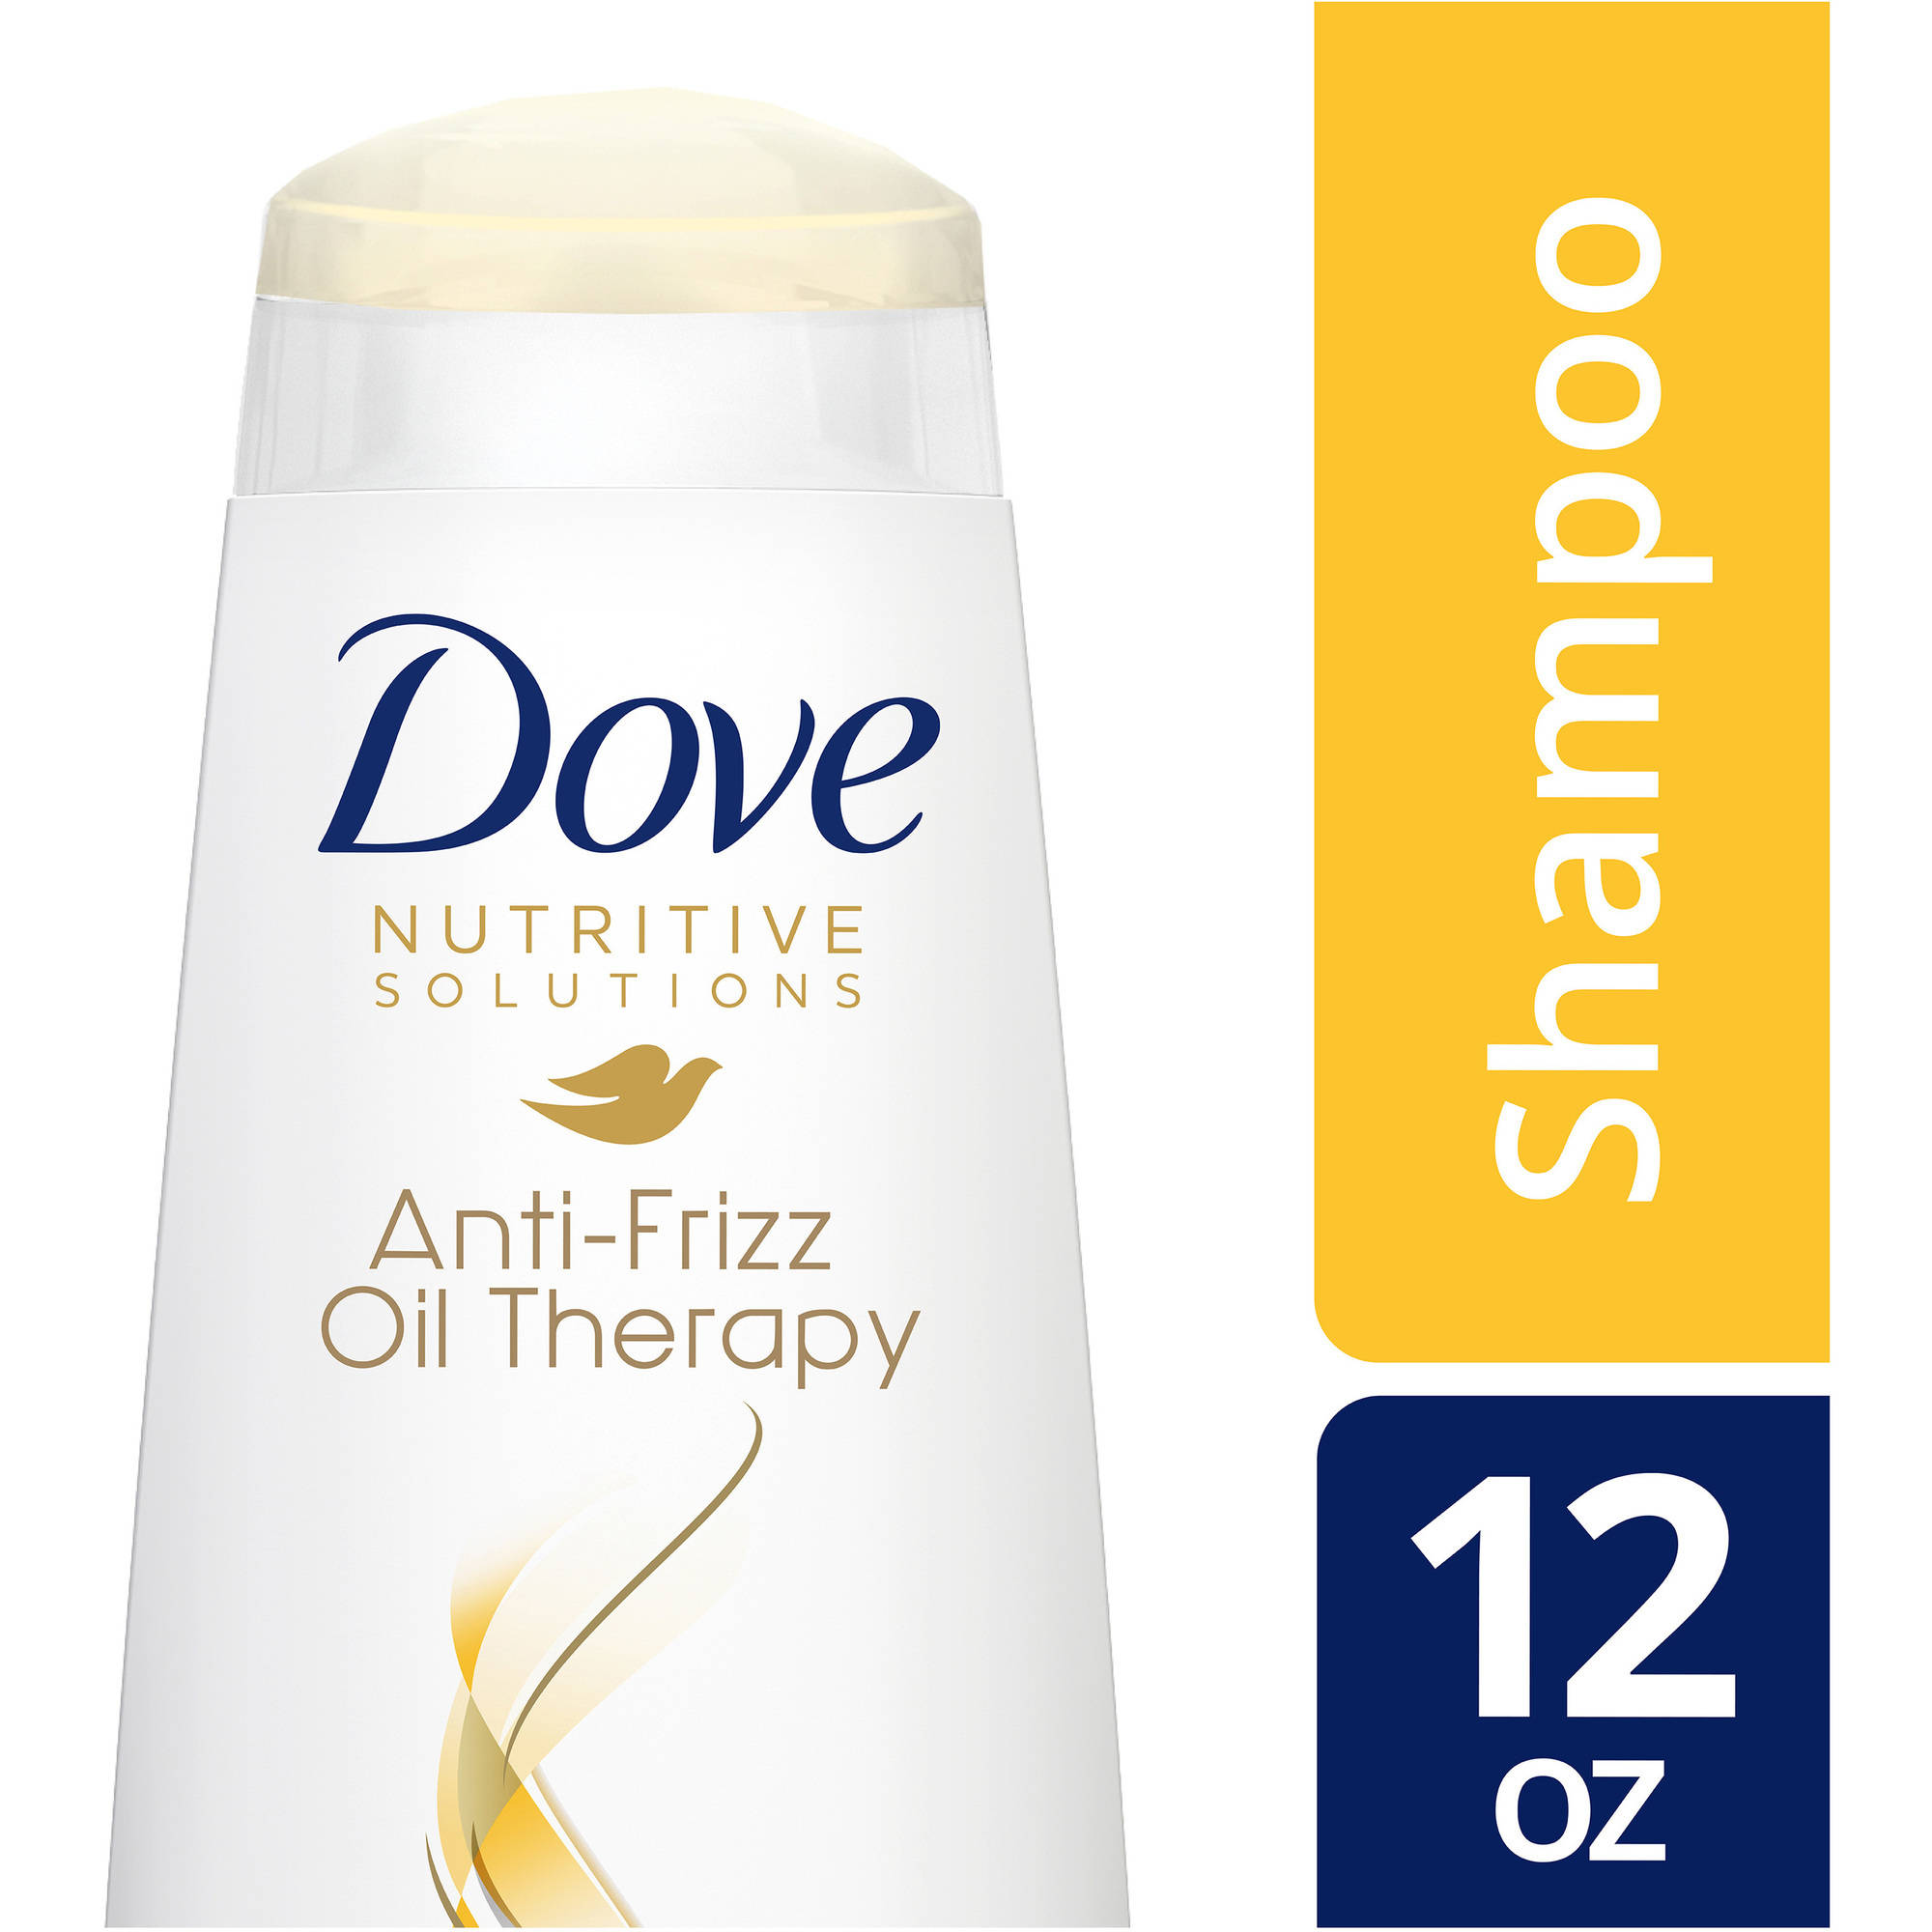 Dove Nutritive Solutions Anti-Frizz Oil Therapy Shampoo, 12 oz